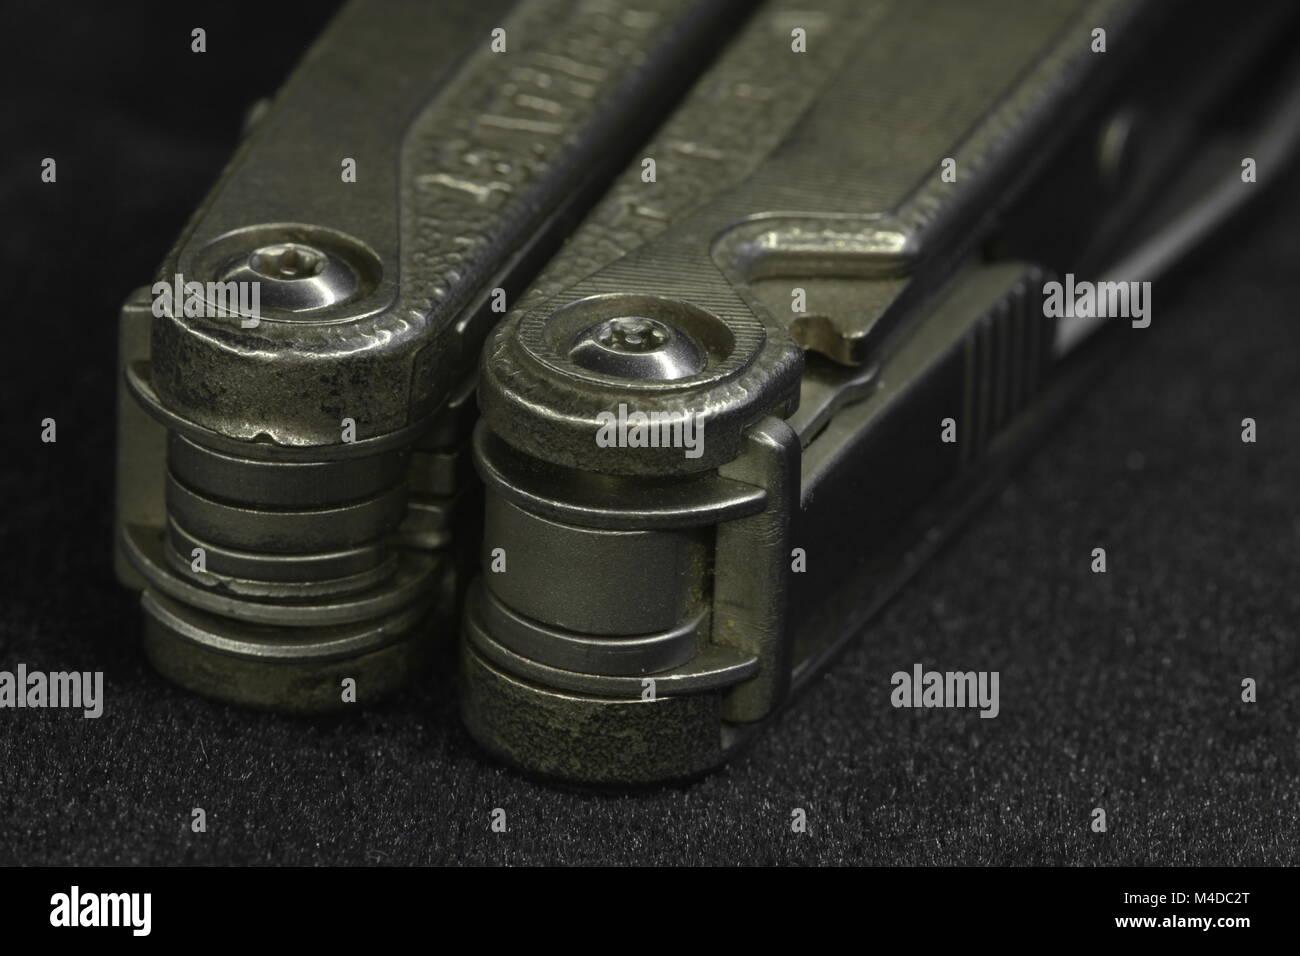 multitool Knife - Stock Image